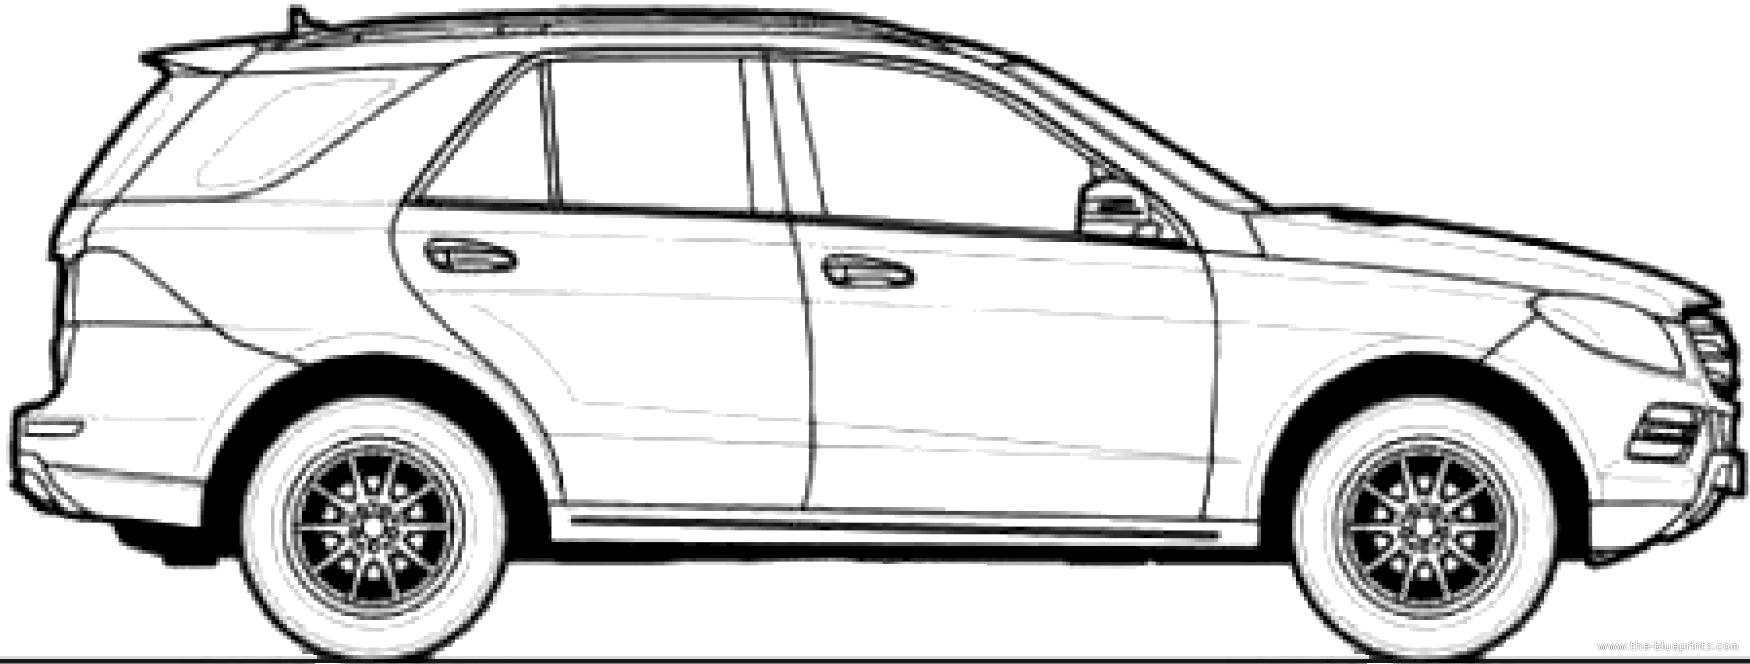 Blueprints > Cars > Mercedes-Benz > Mercedes-Benz ML250 (2013)